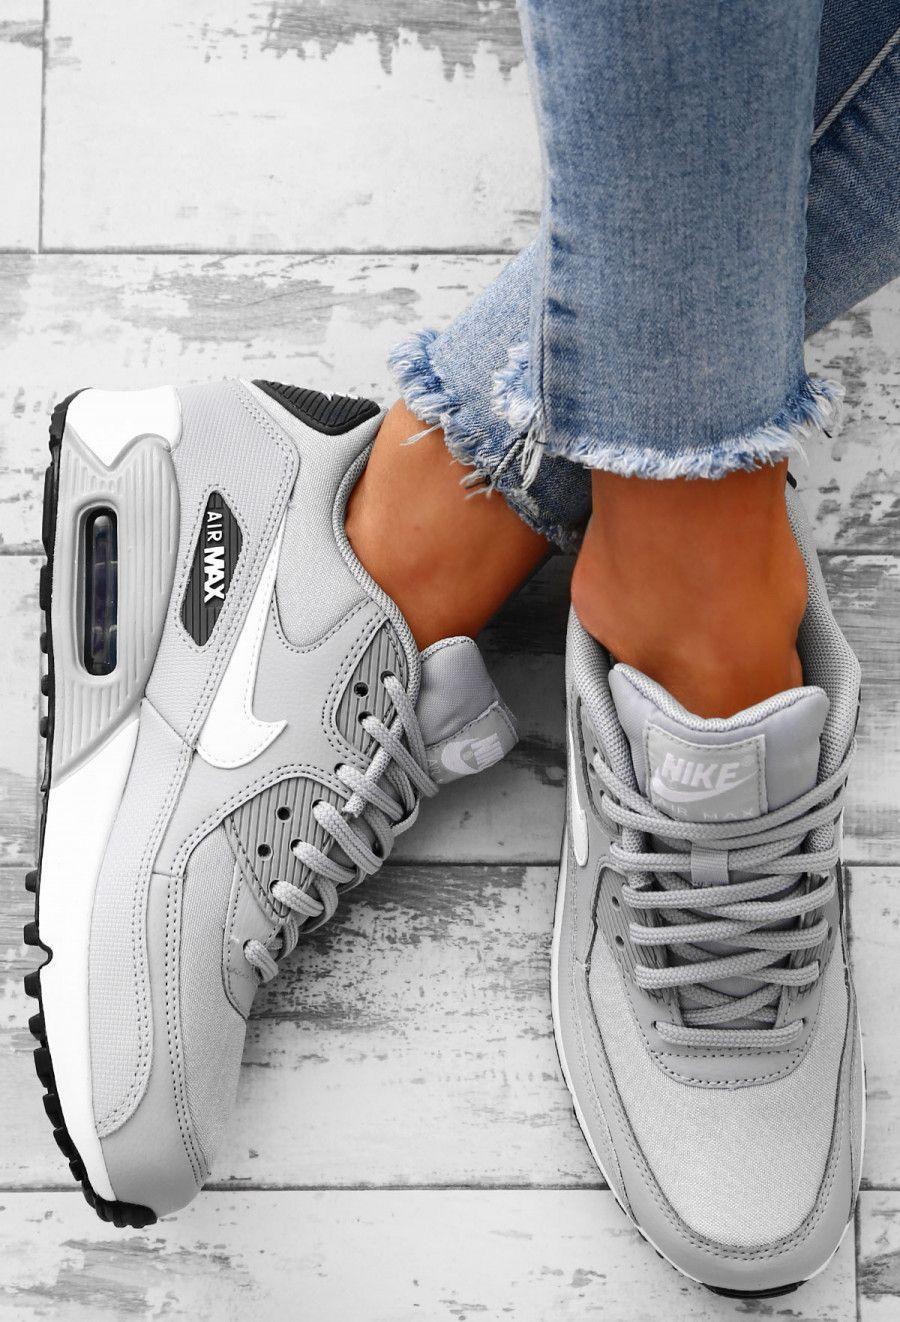 Nike Air Max 90 Grey Trainers